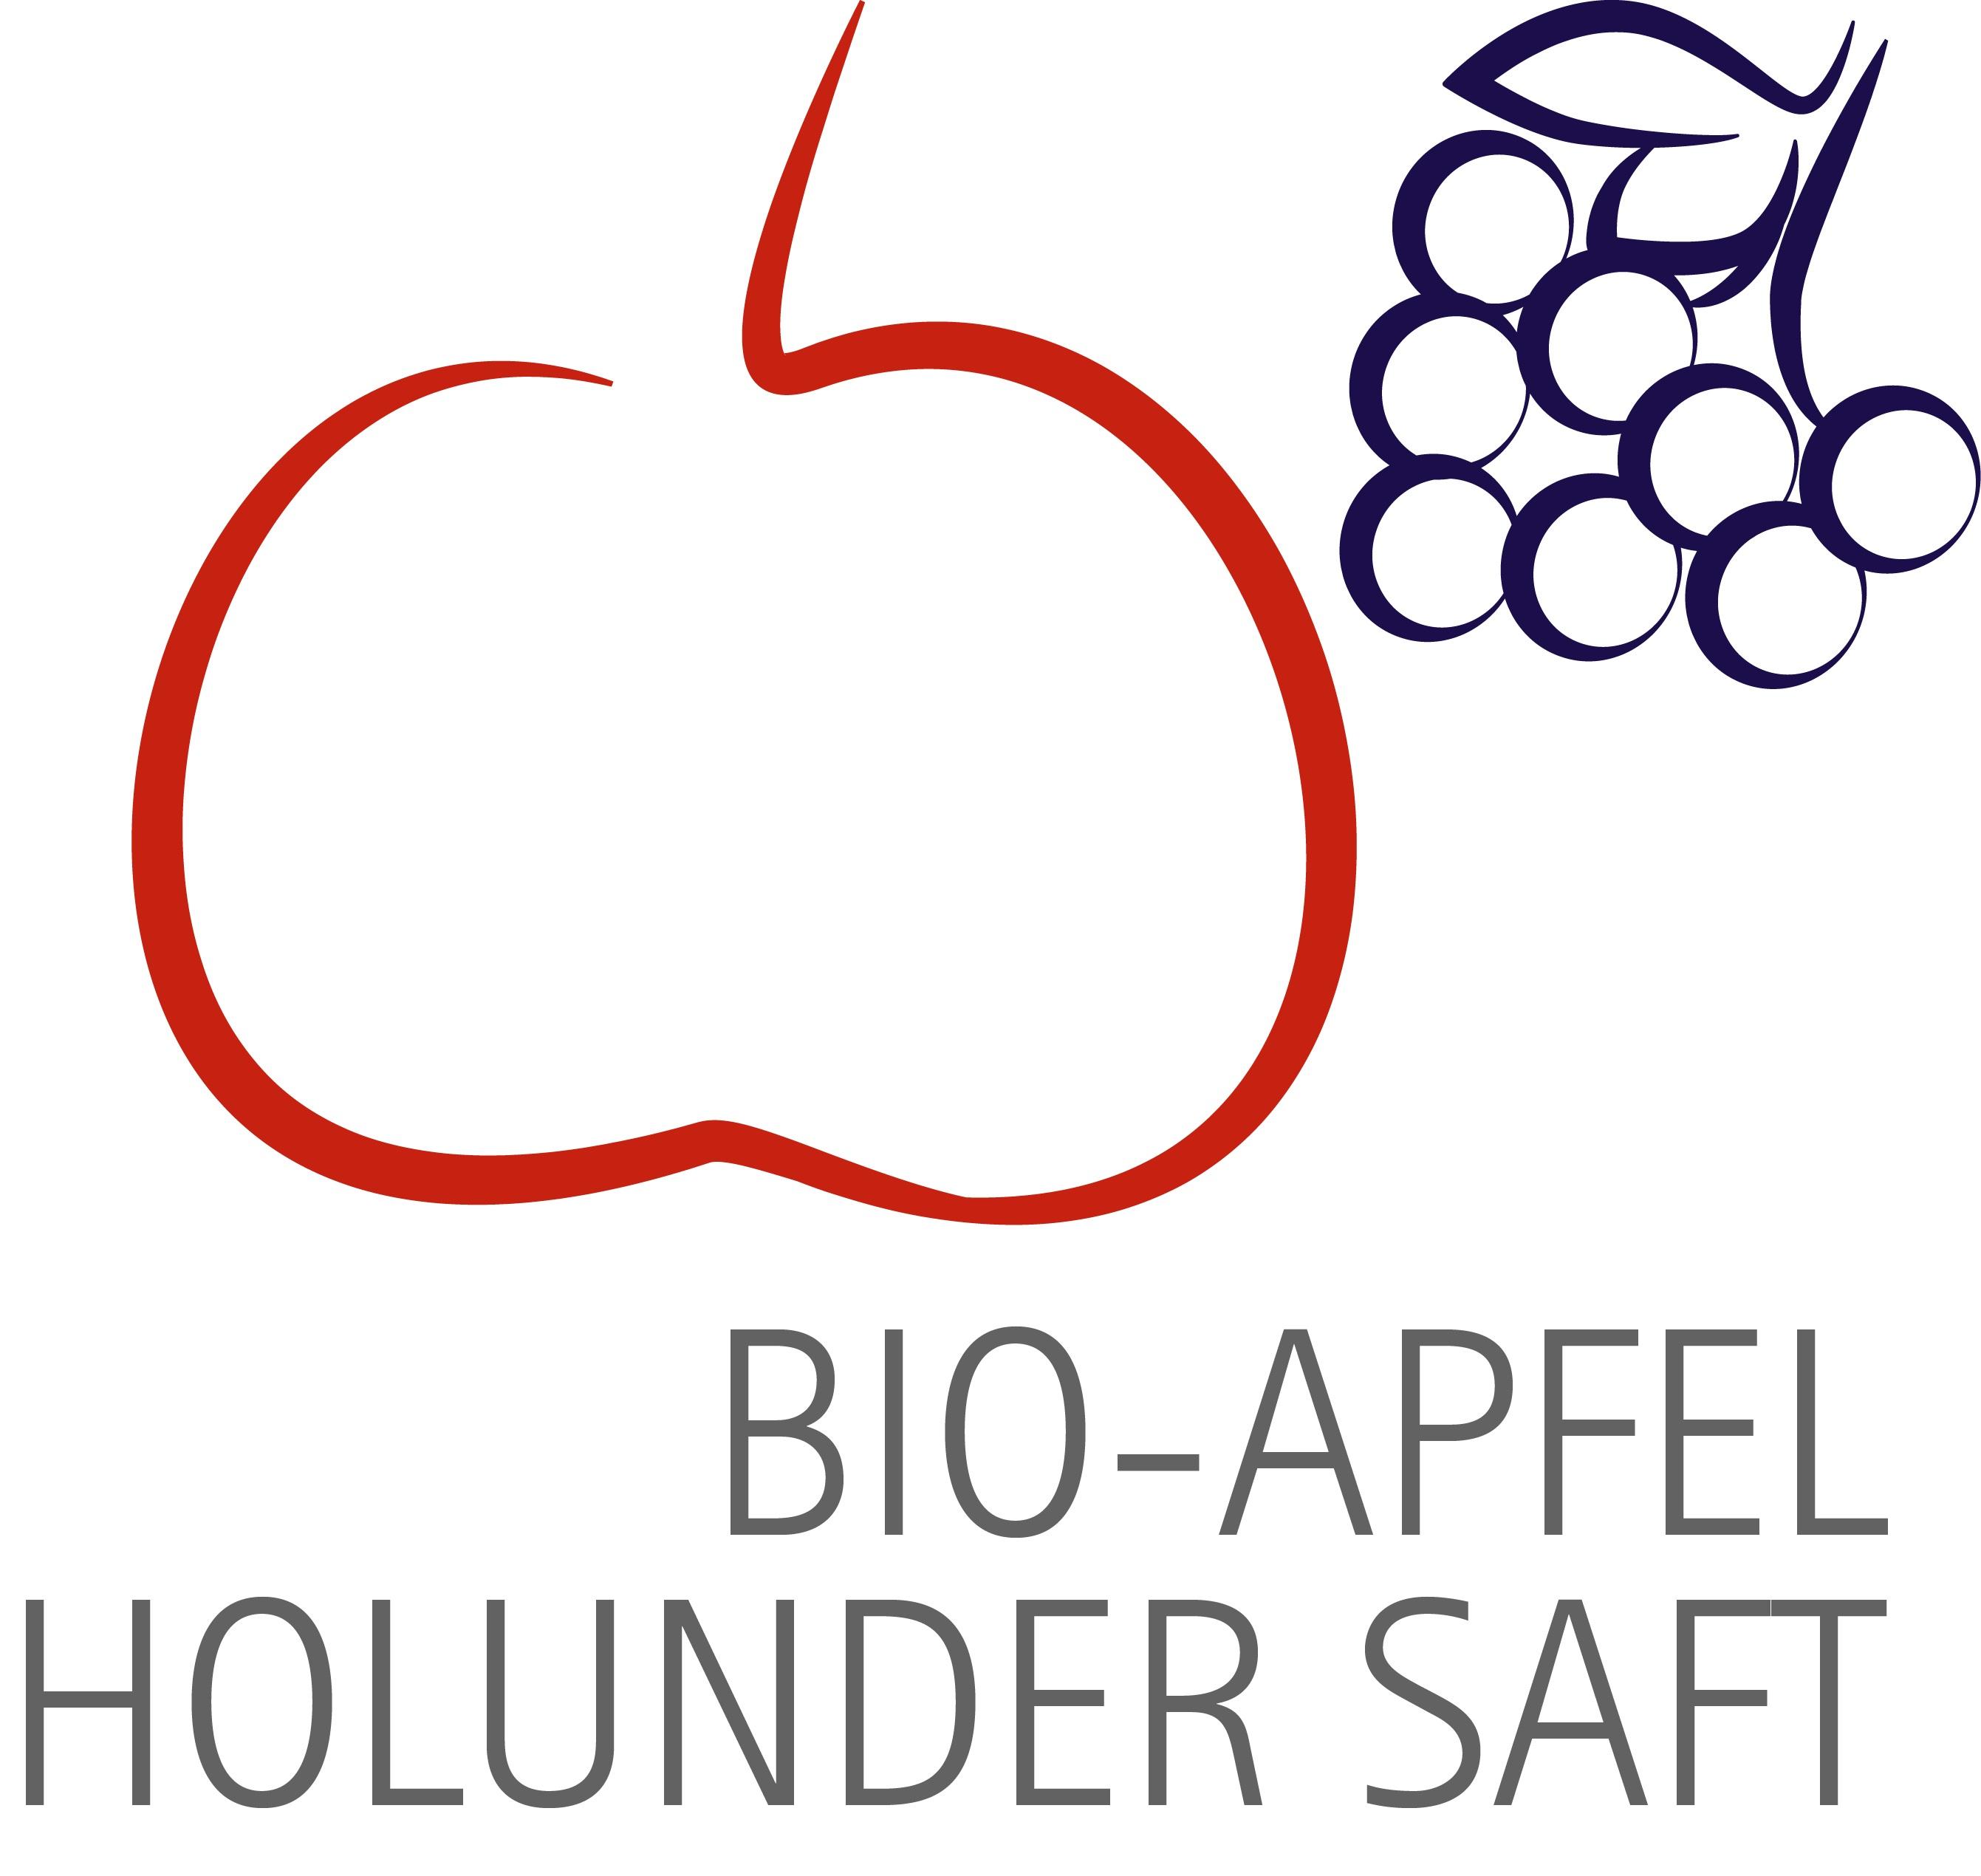 schweighofer_produktlogos-saft-apfel-holunder_201218